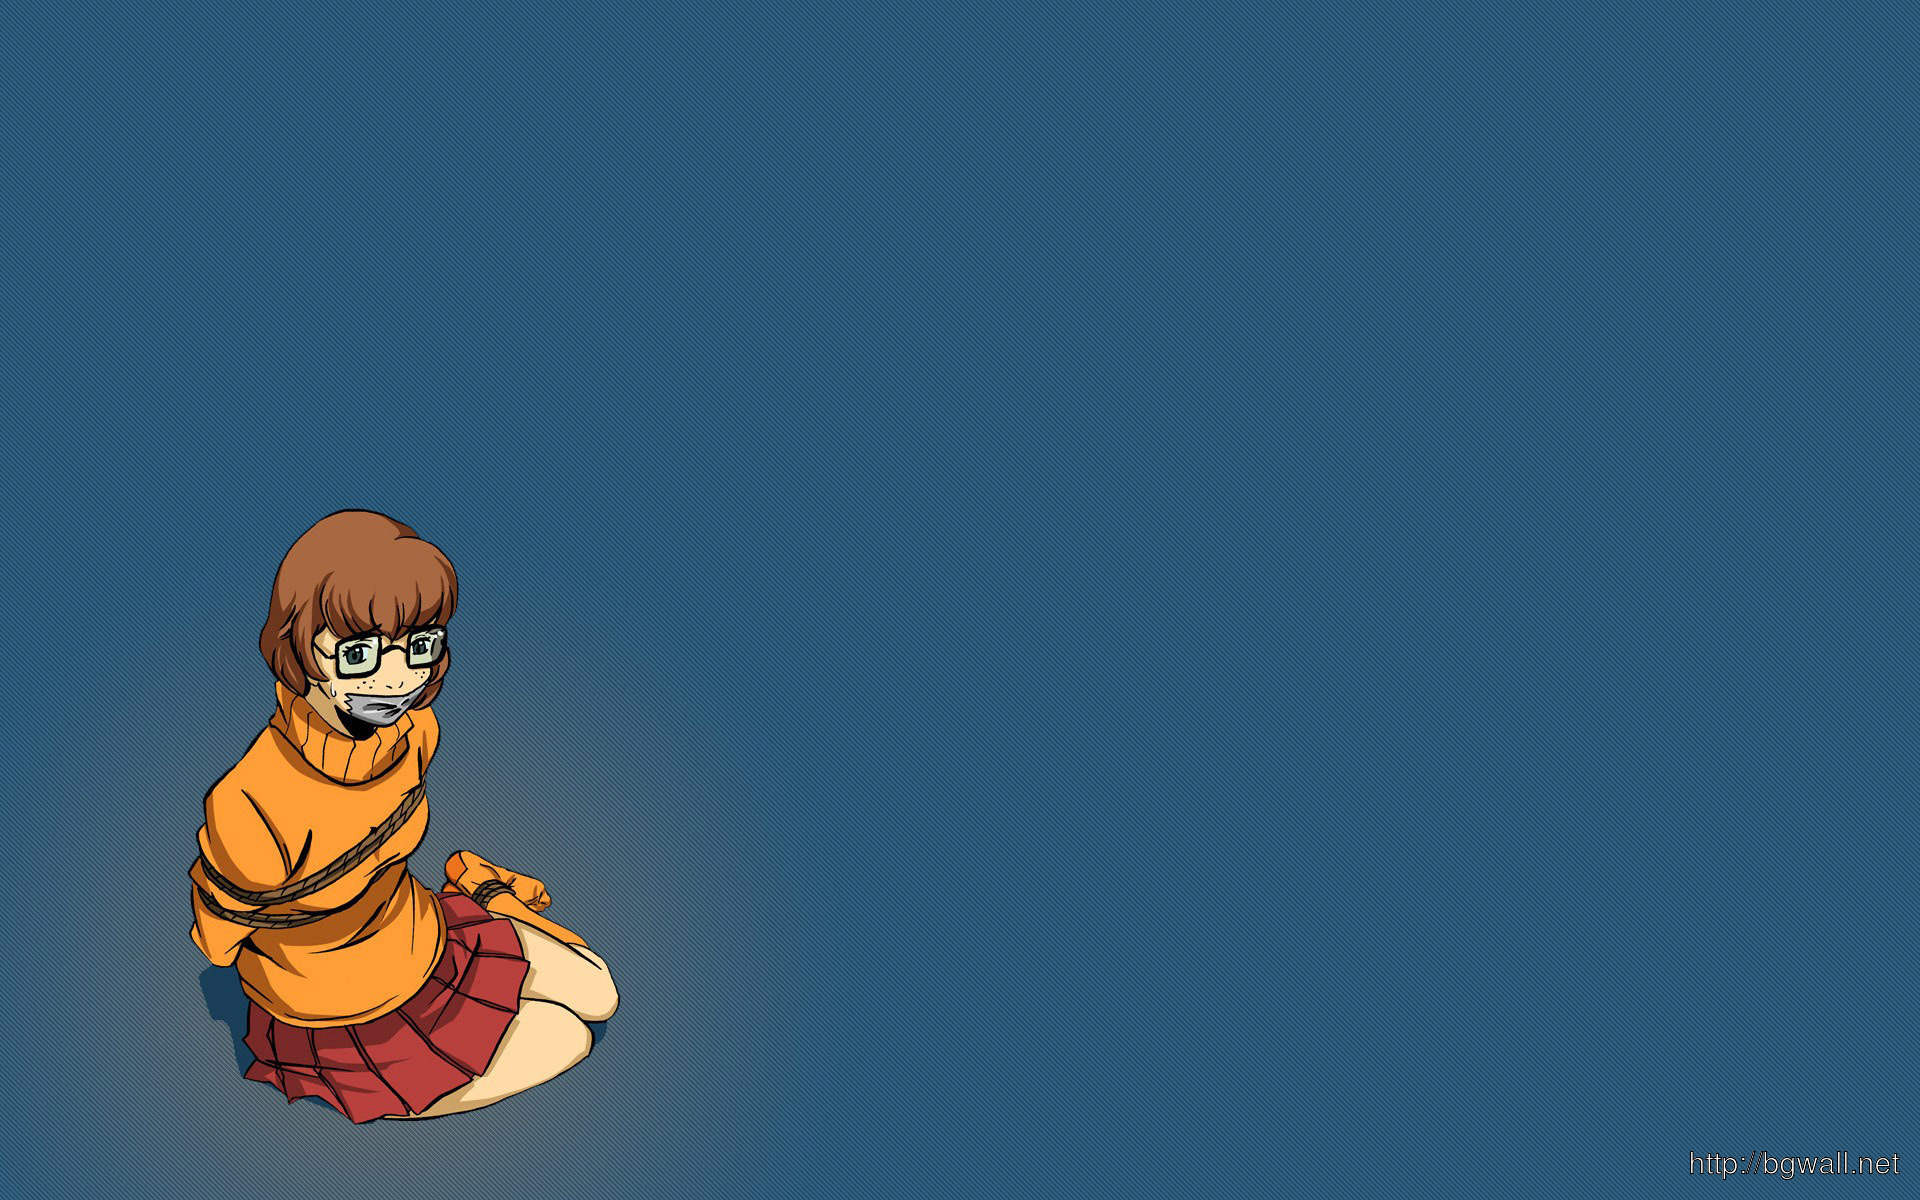 Velma-Scooby-Doo-Free-Wallpaper